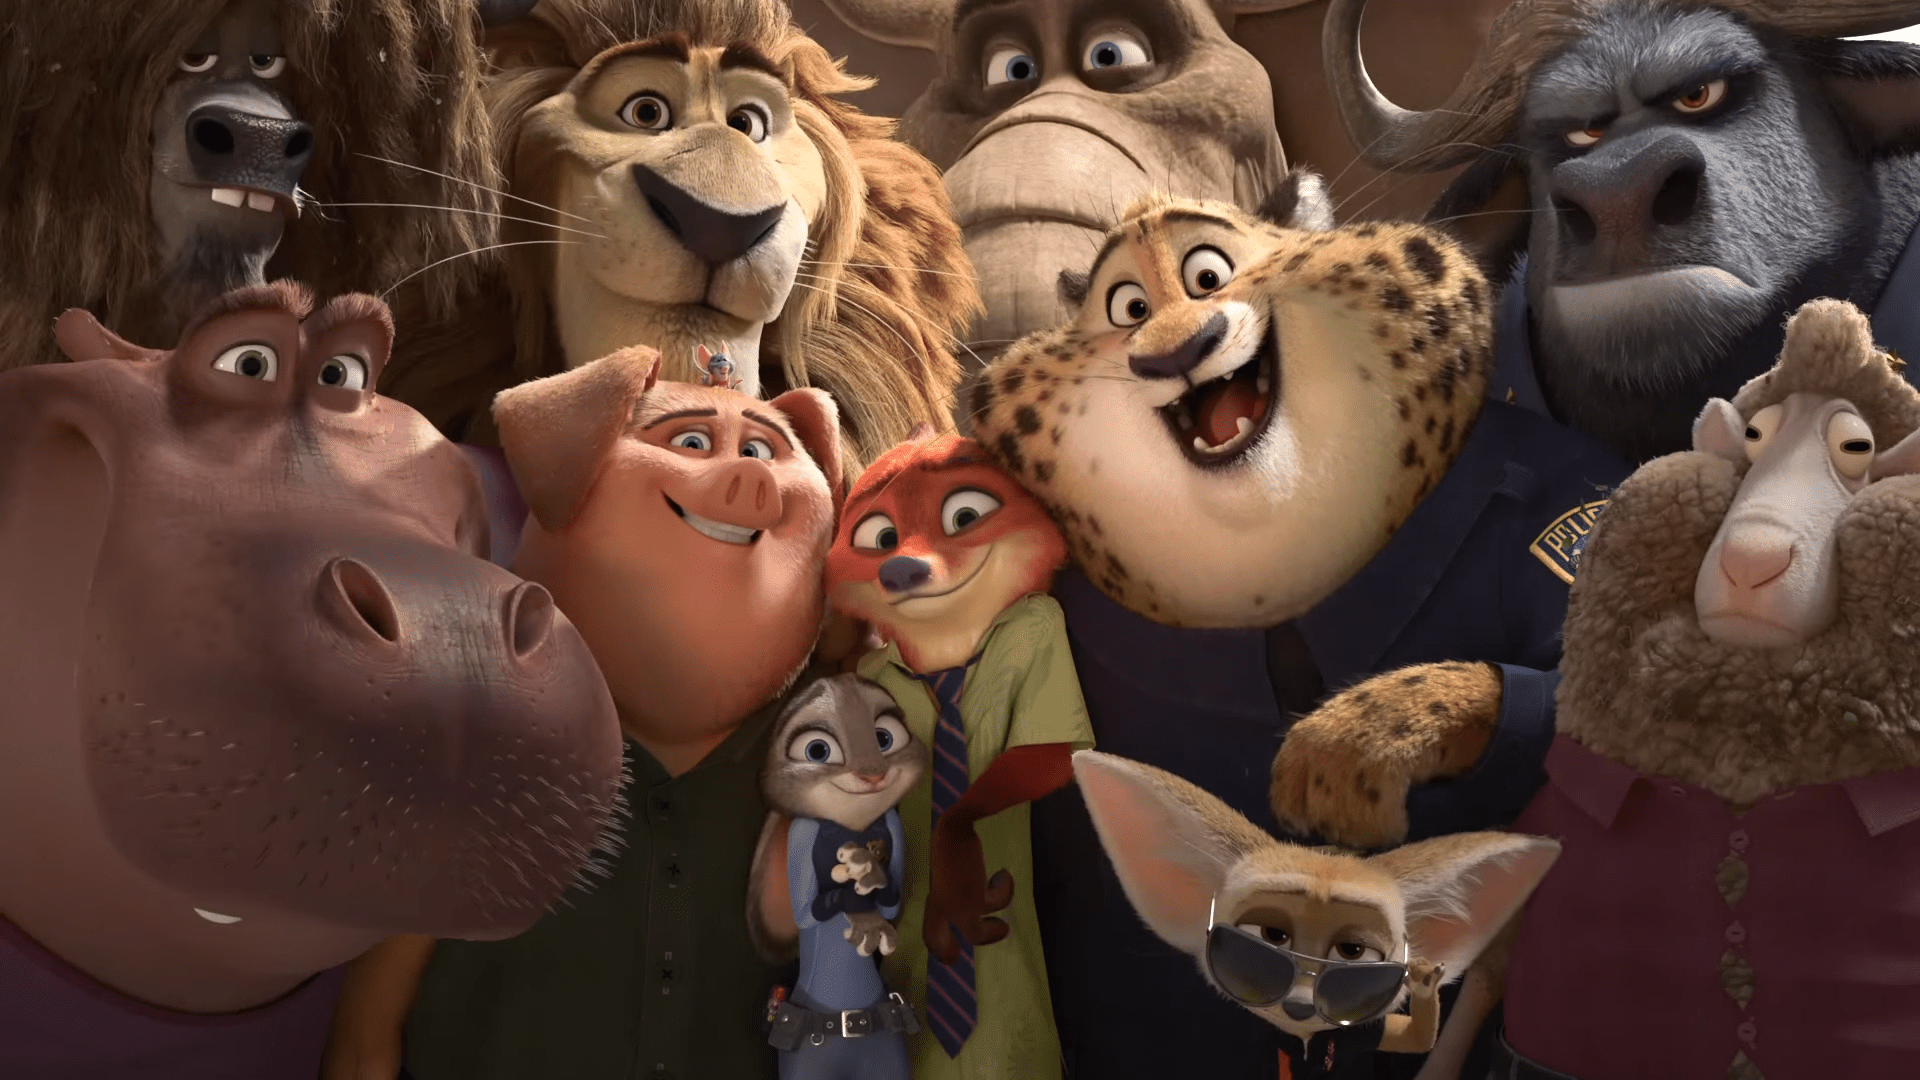 Zootopia' Hops To $800M+ Global; Top 2016 Grosser Still Has Play – Deadline